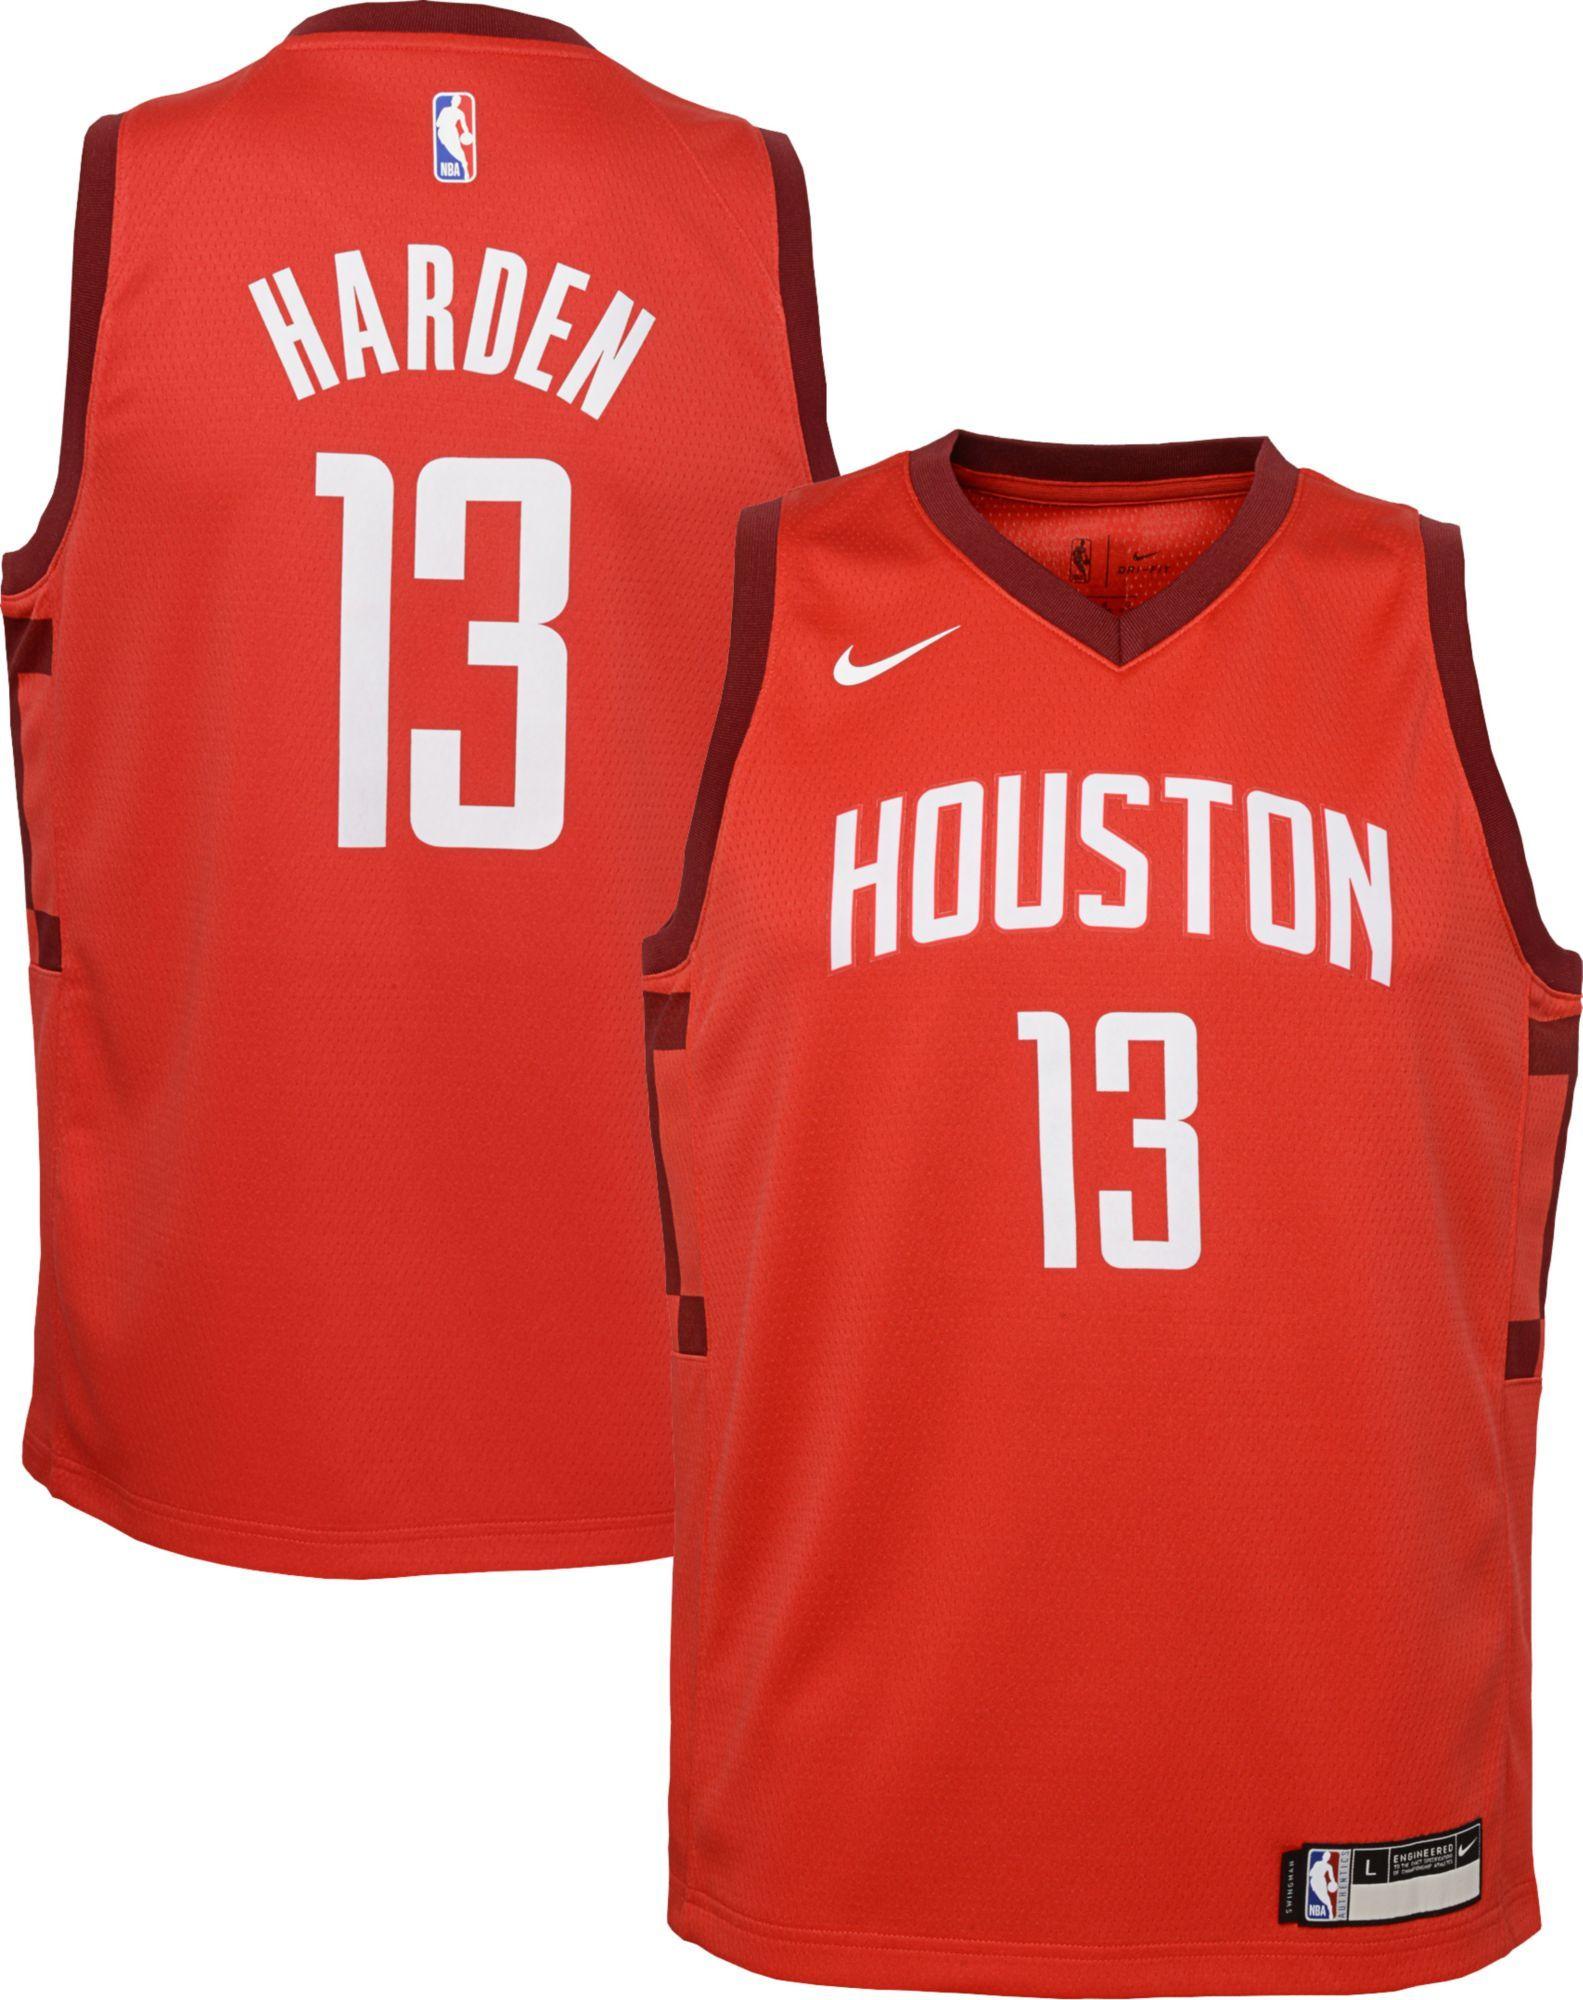 b7c6f808910 Nike Youth Houston Rockets James Harden Dri-FIT Earned Edition Swingman  Jersey, Size: Medium, Red